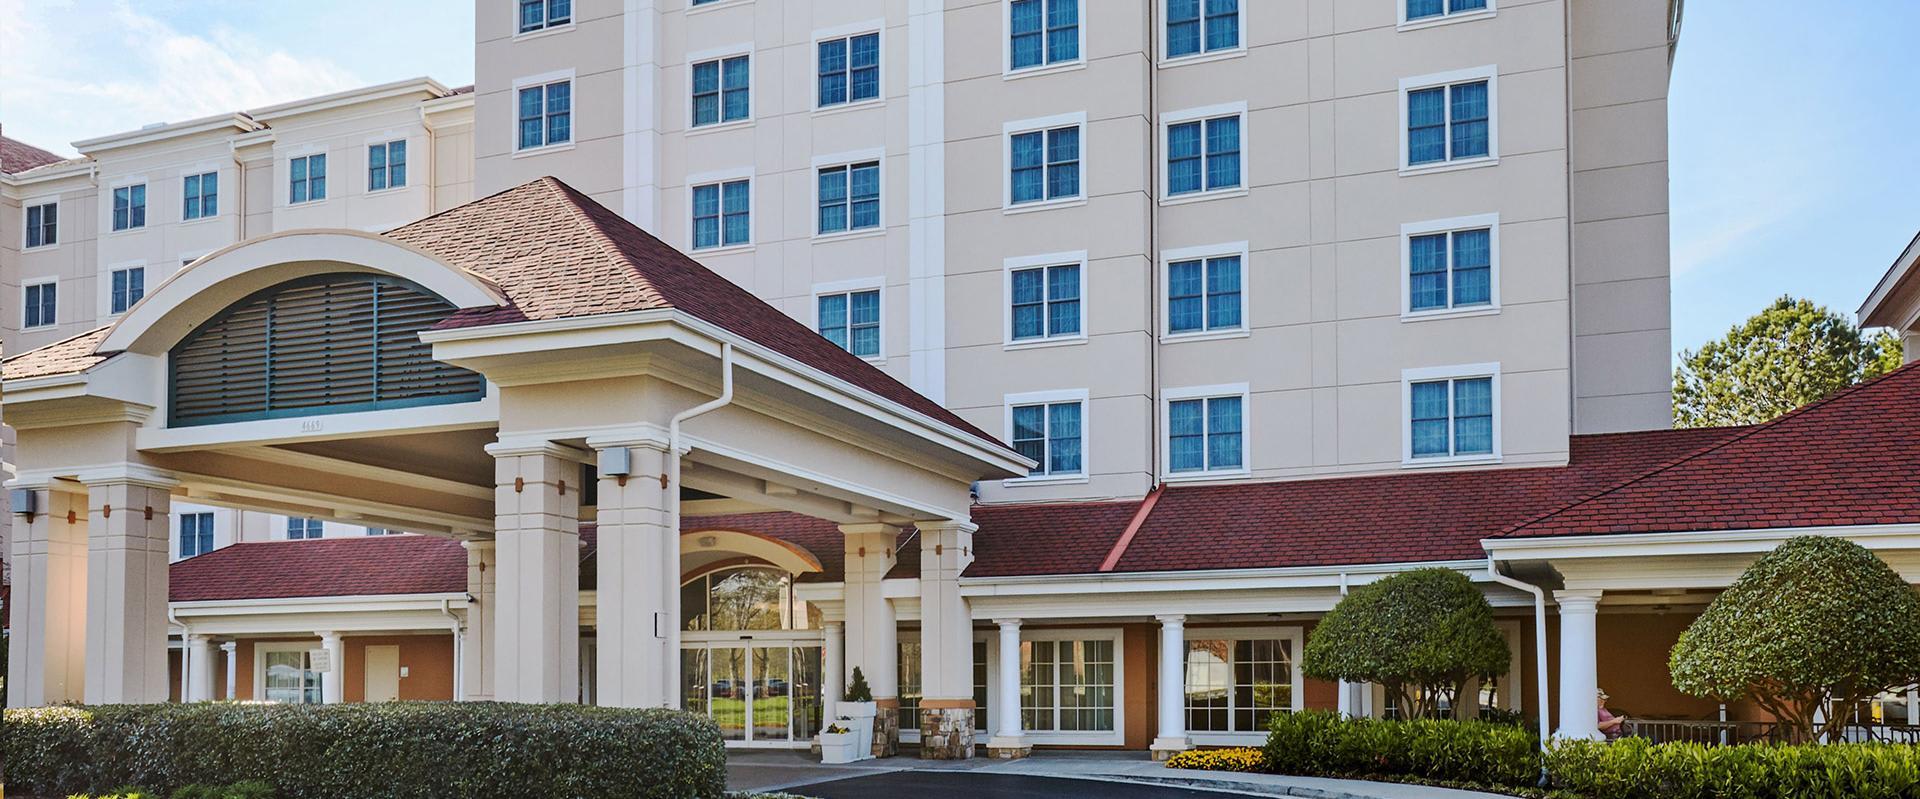 Atlanta Airport Hotel Exterior